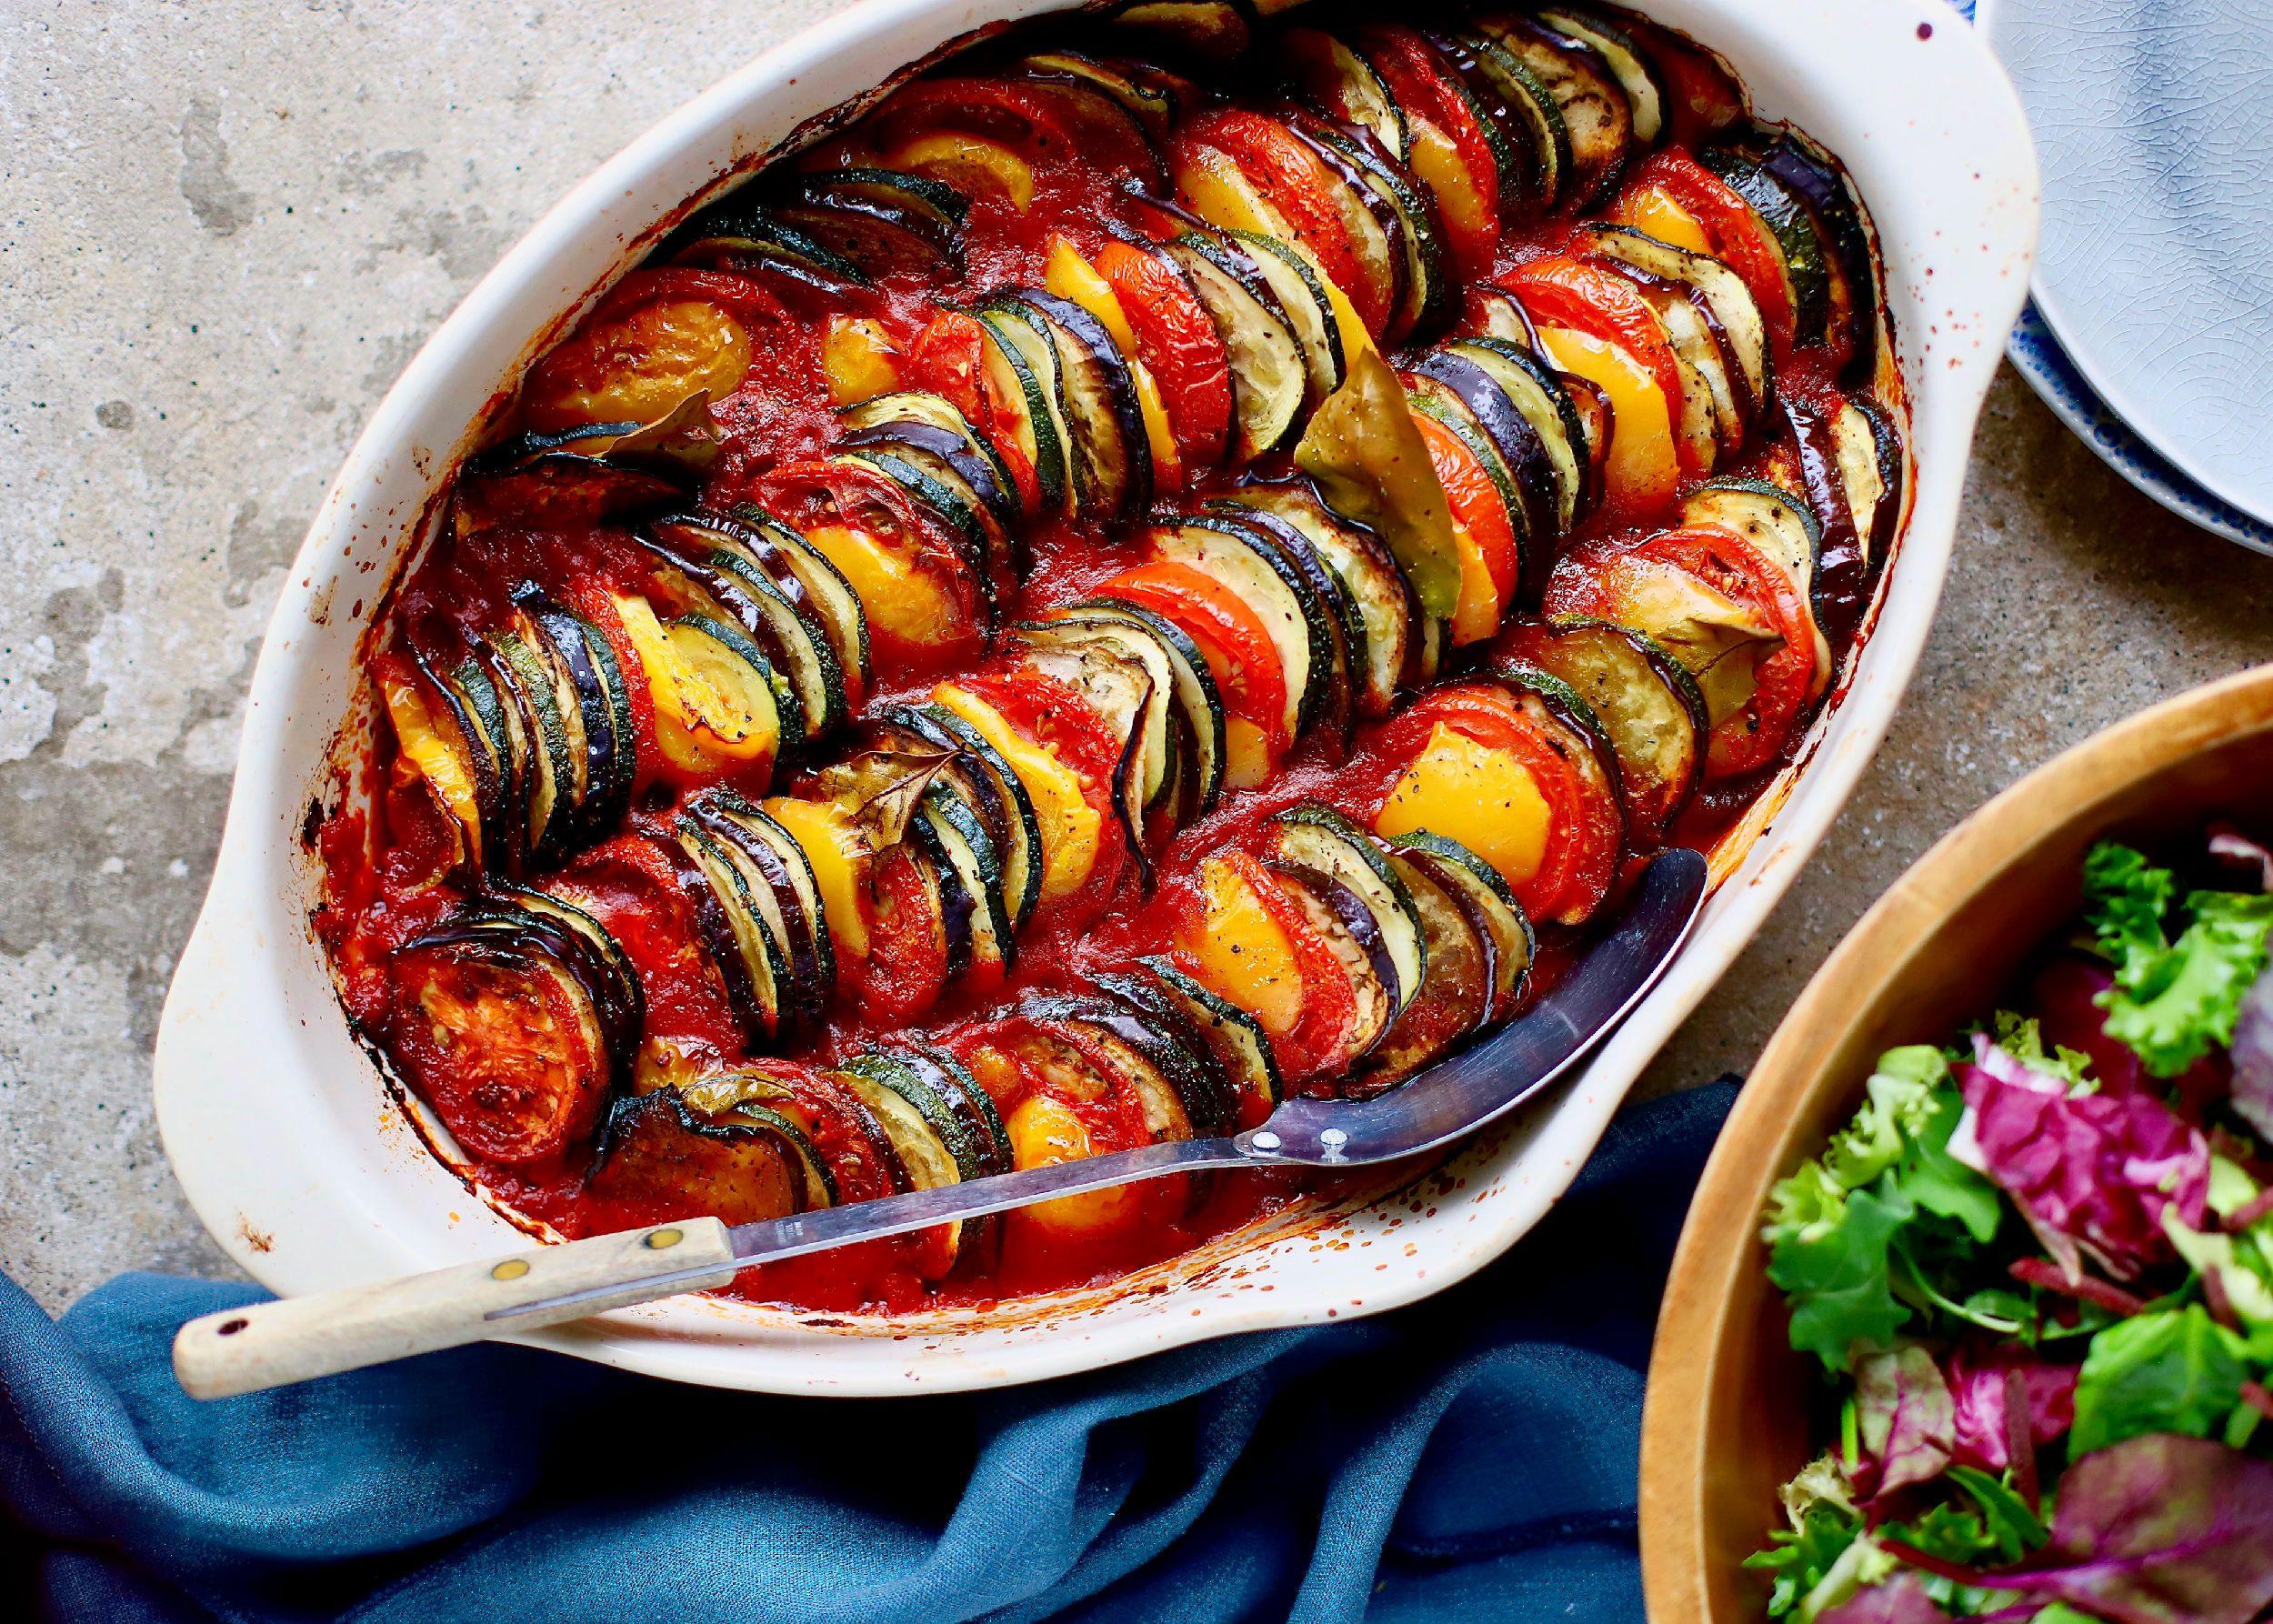 Make-Ahead Recipes | Meal Prep Guide | Pizza Pasta Salad